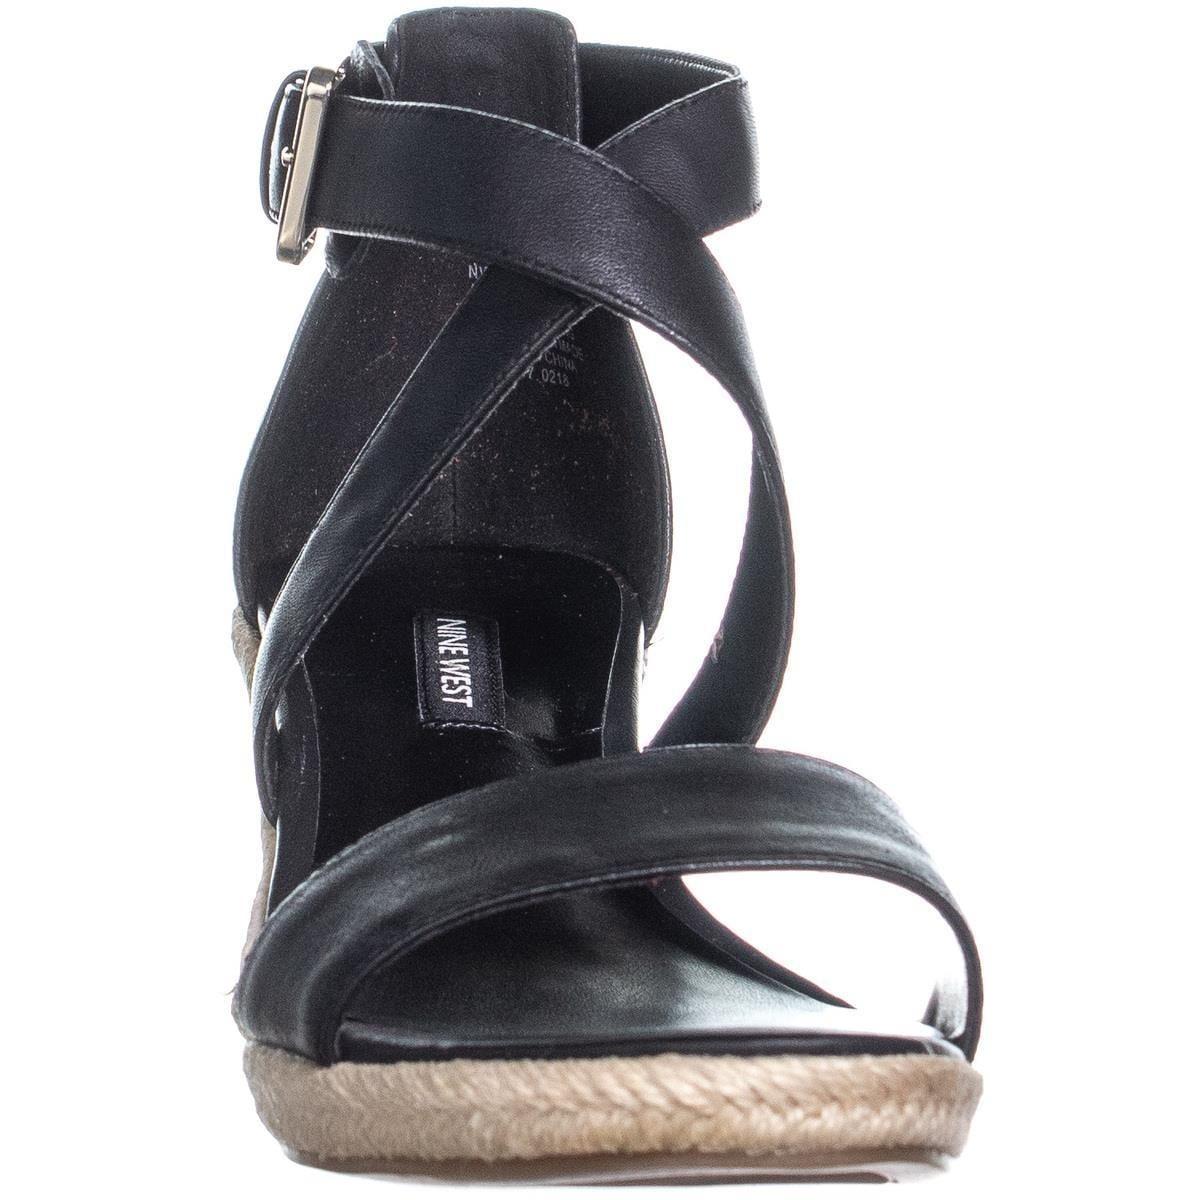 fd09666015f Nine West JorgaPeach Espadrilles Sandals, Black